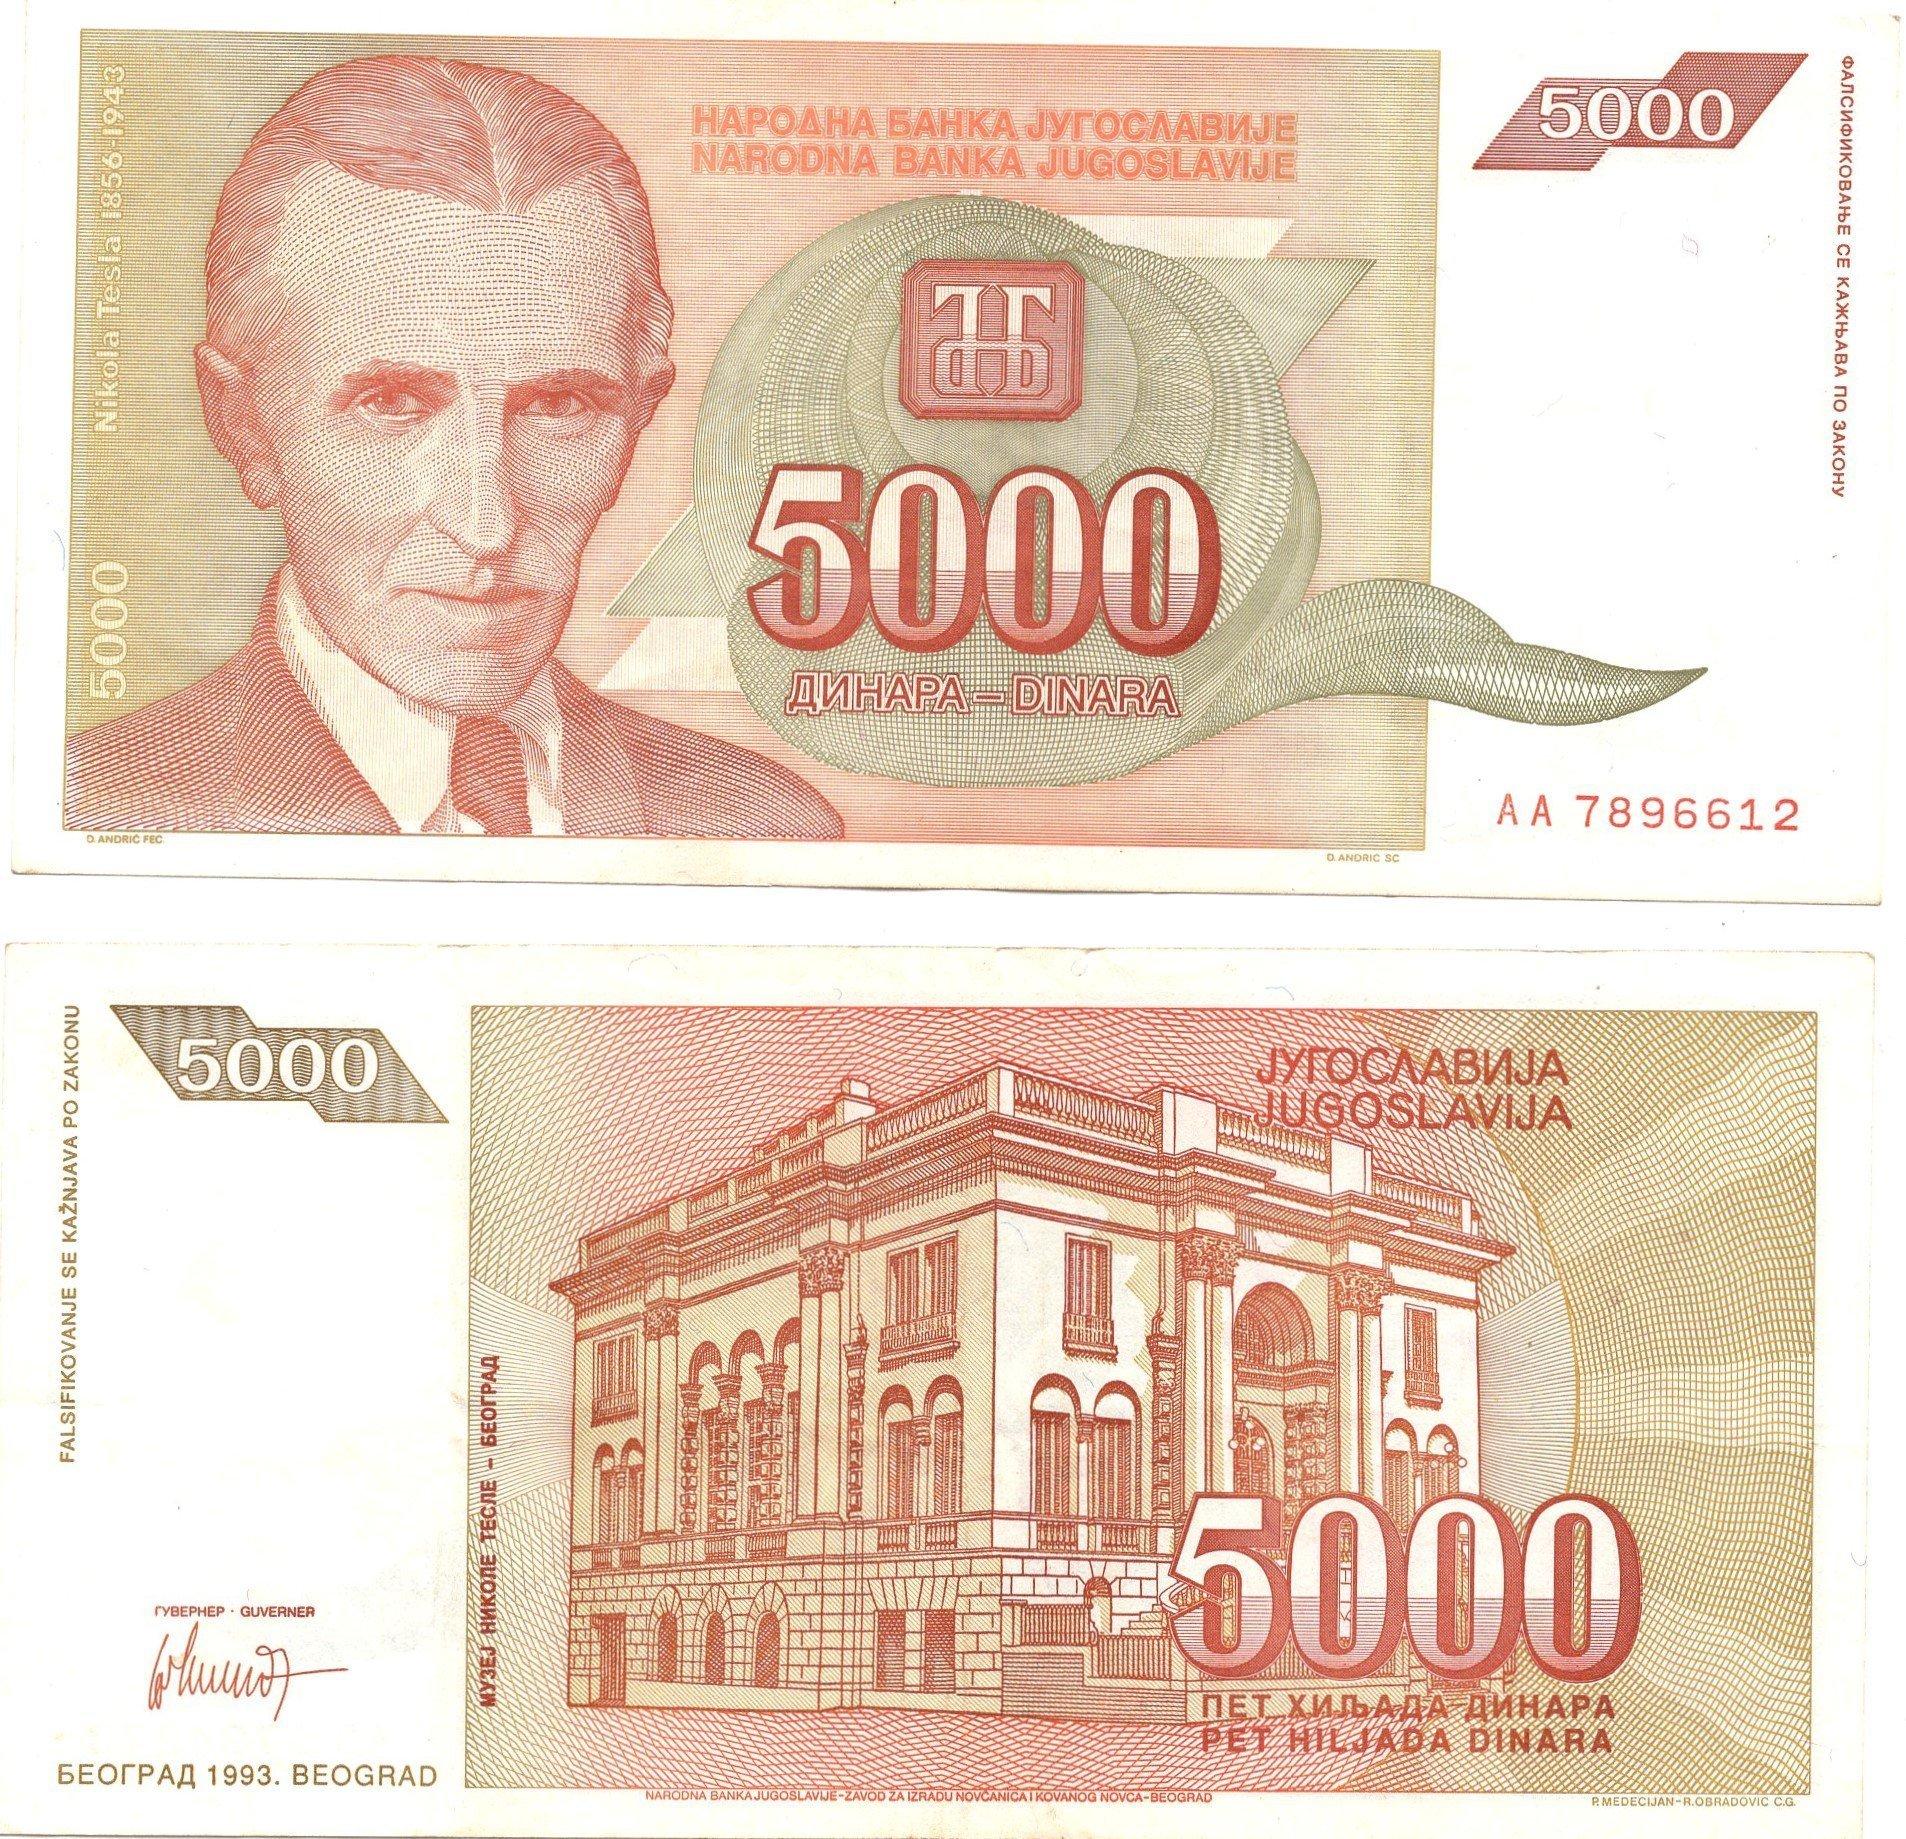 Yugoslavia 5000 dinara 1993 banknote for sale